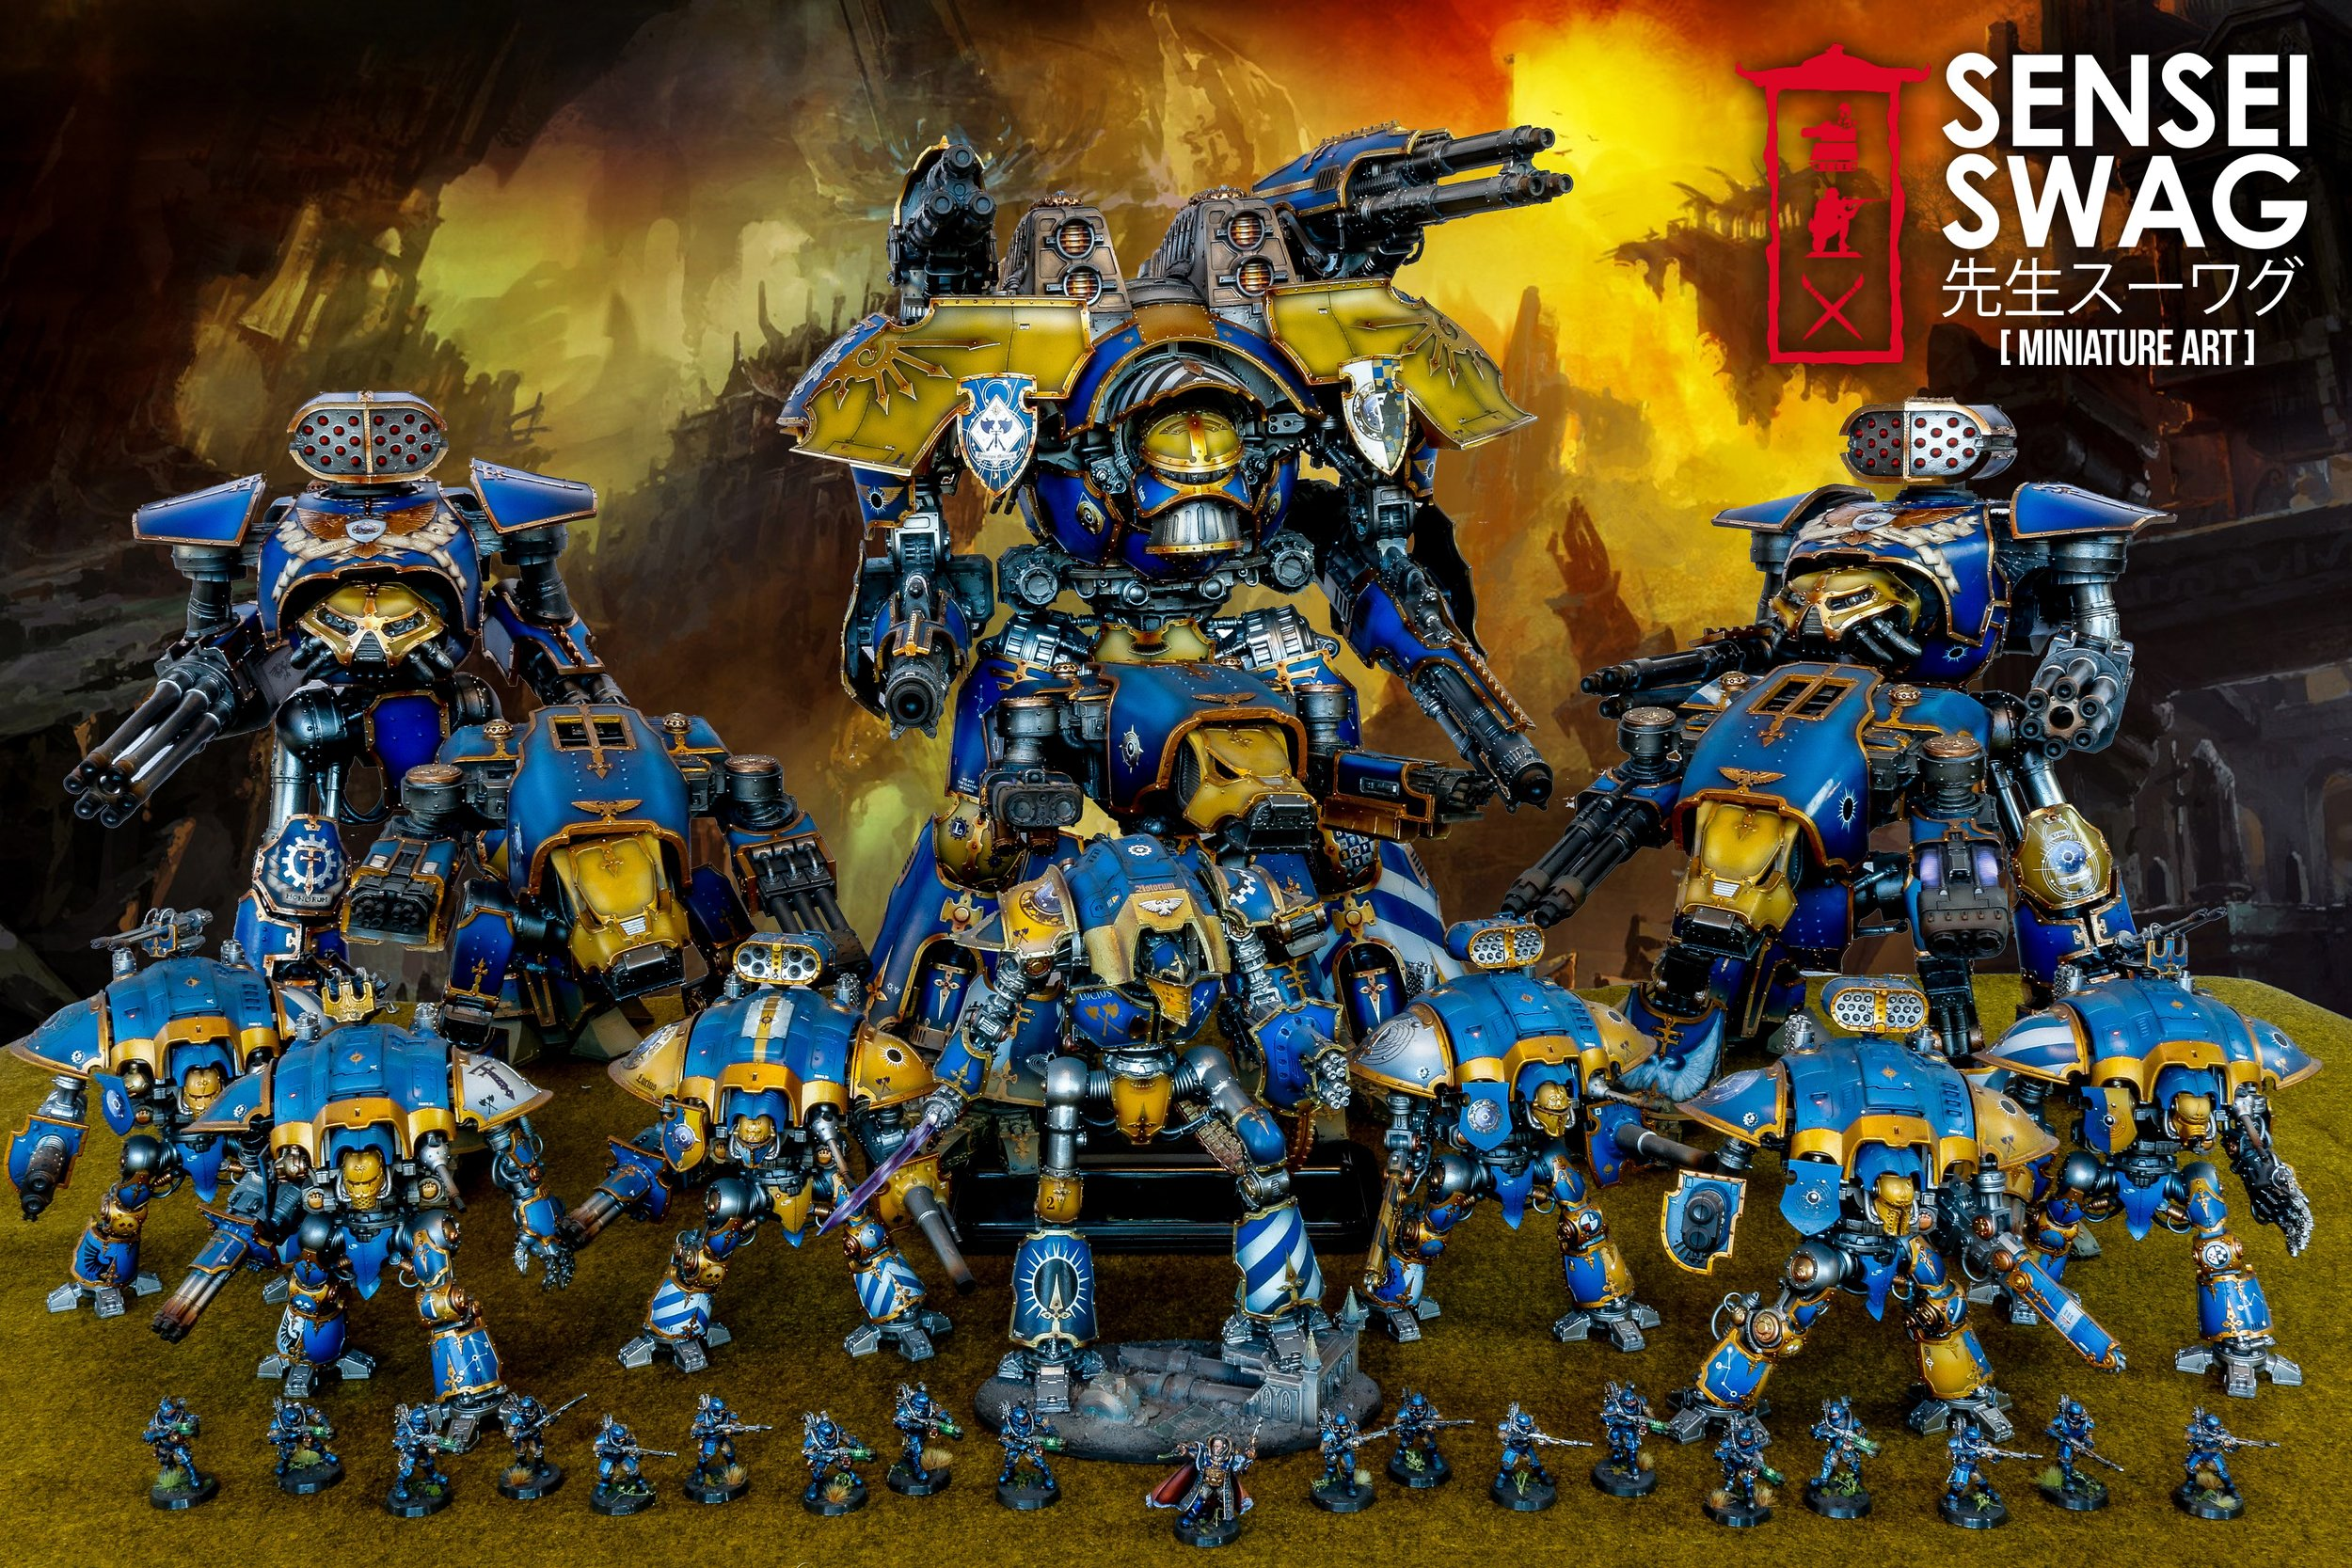 Legio Astorum Titan Maniple 40k Warlord Reaver Warhound Knight-1-2 Scale.jpg